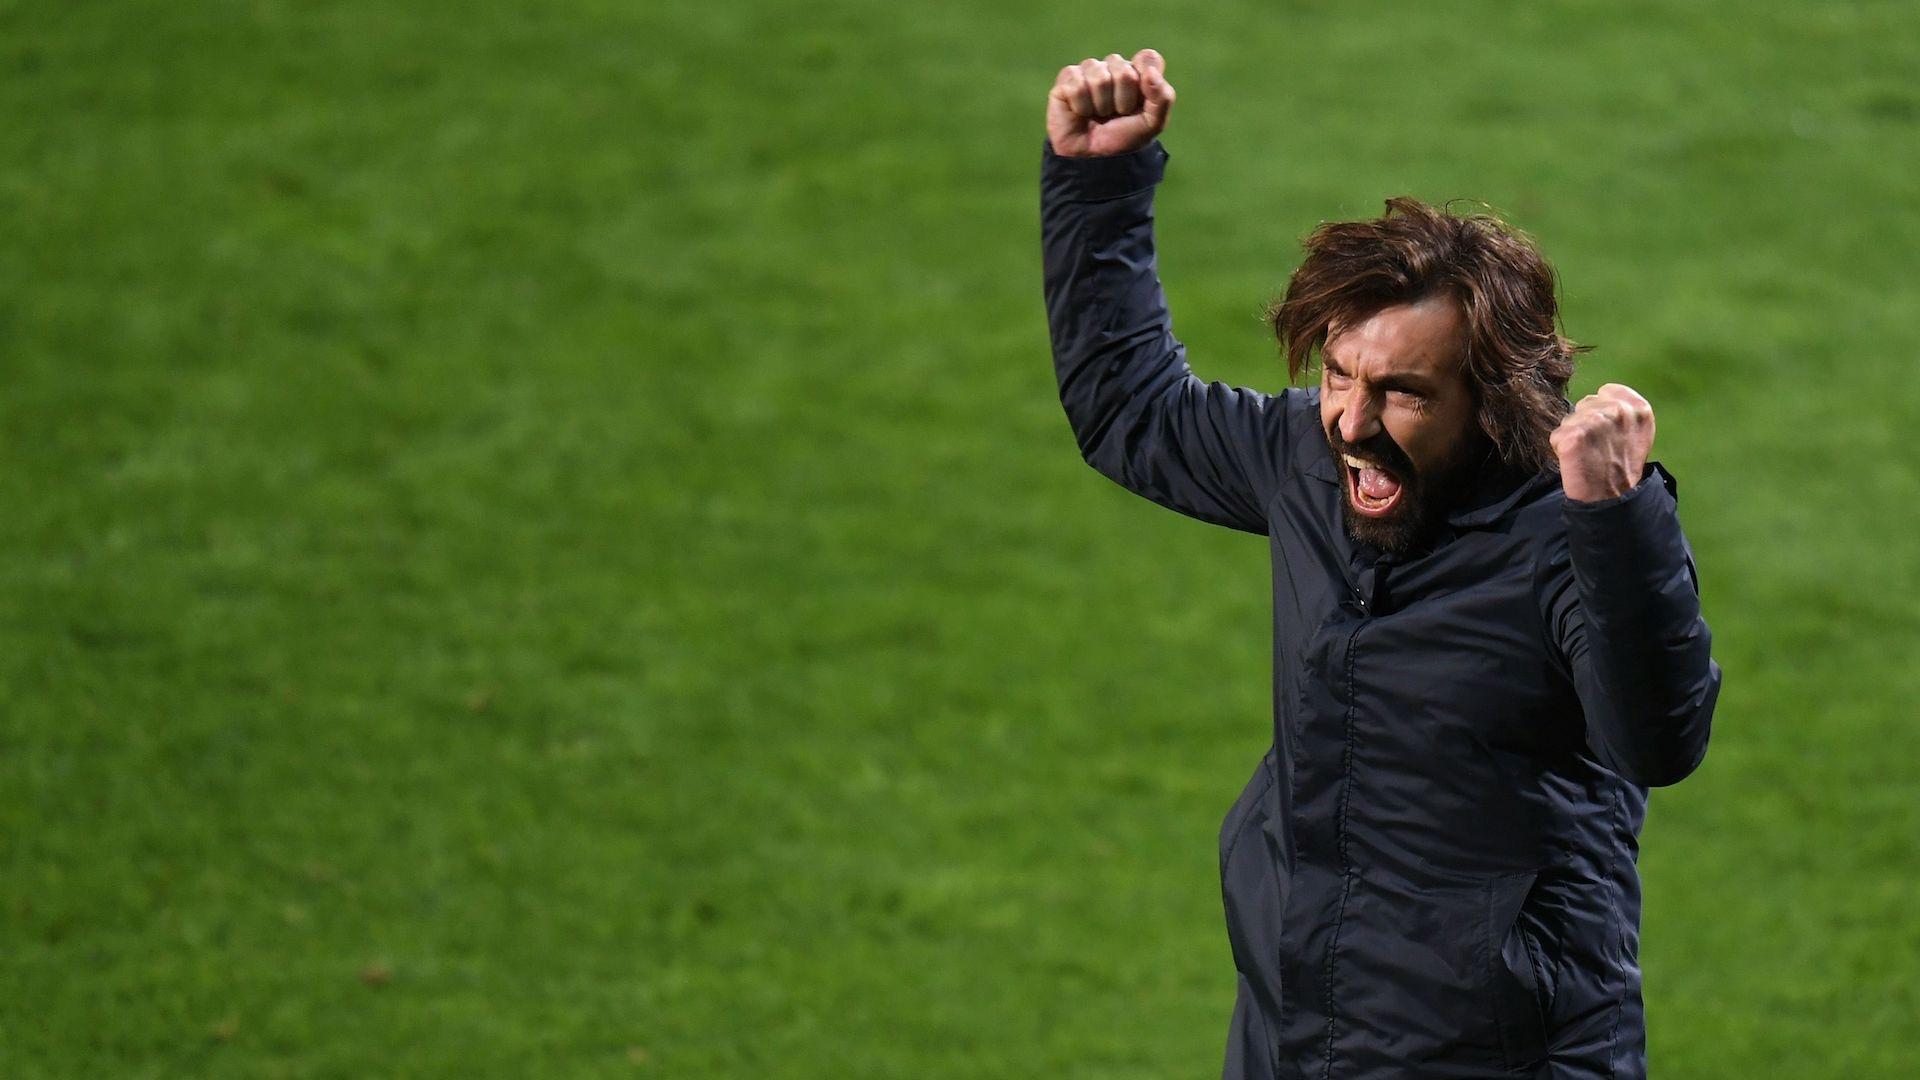 Finale Coppa-Italia: Atalanta-Juventus 1-2, le foto - Finale Coppa-Italia:  Atalanta-Juventus 1-2, le foto | Virgilio Sport